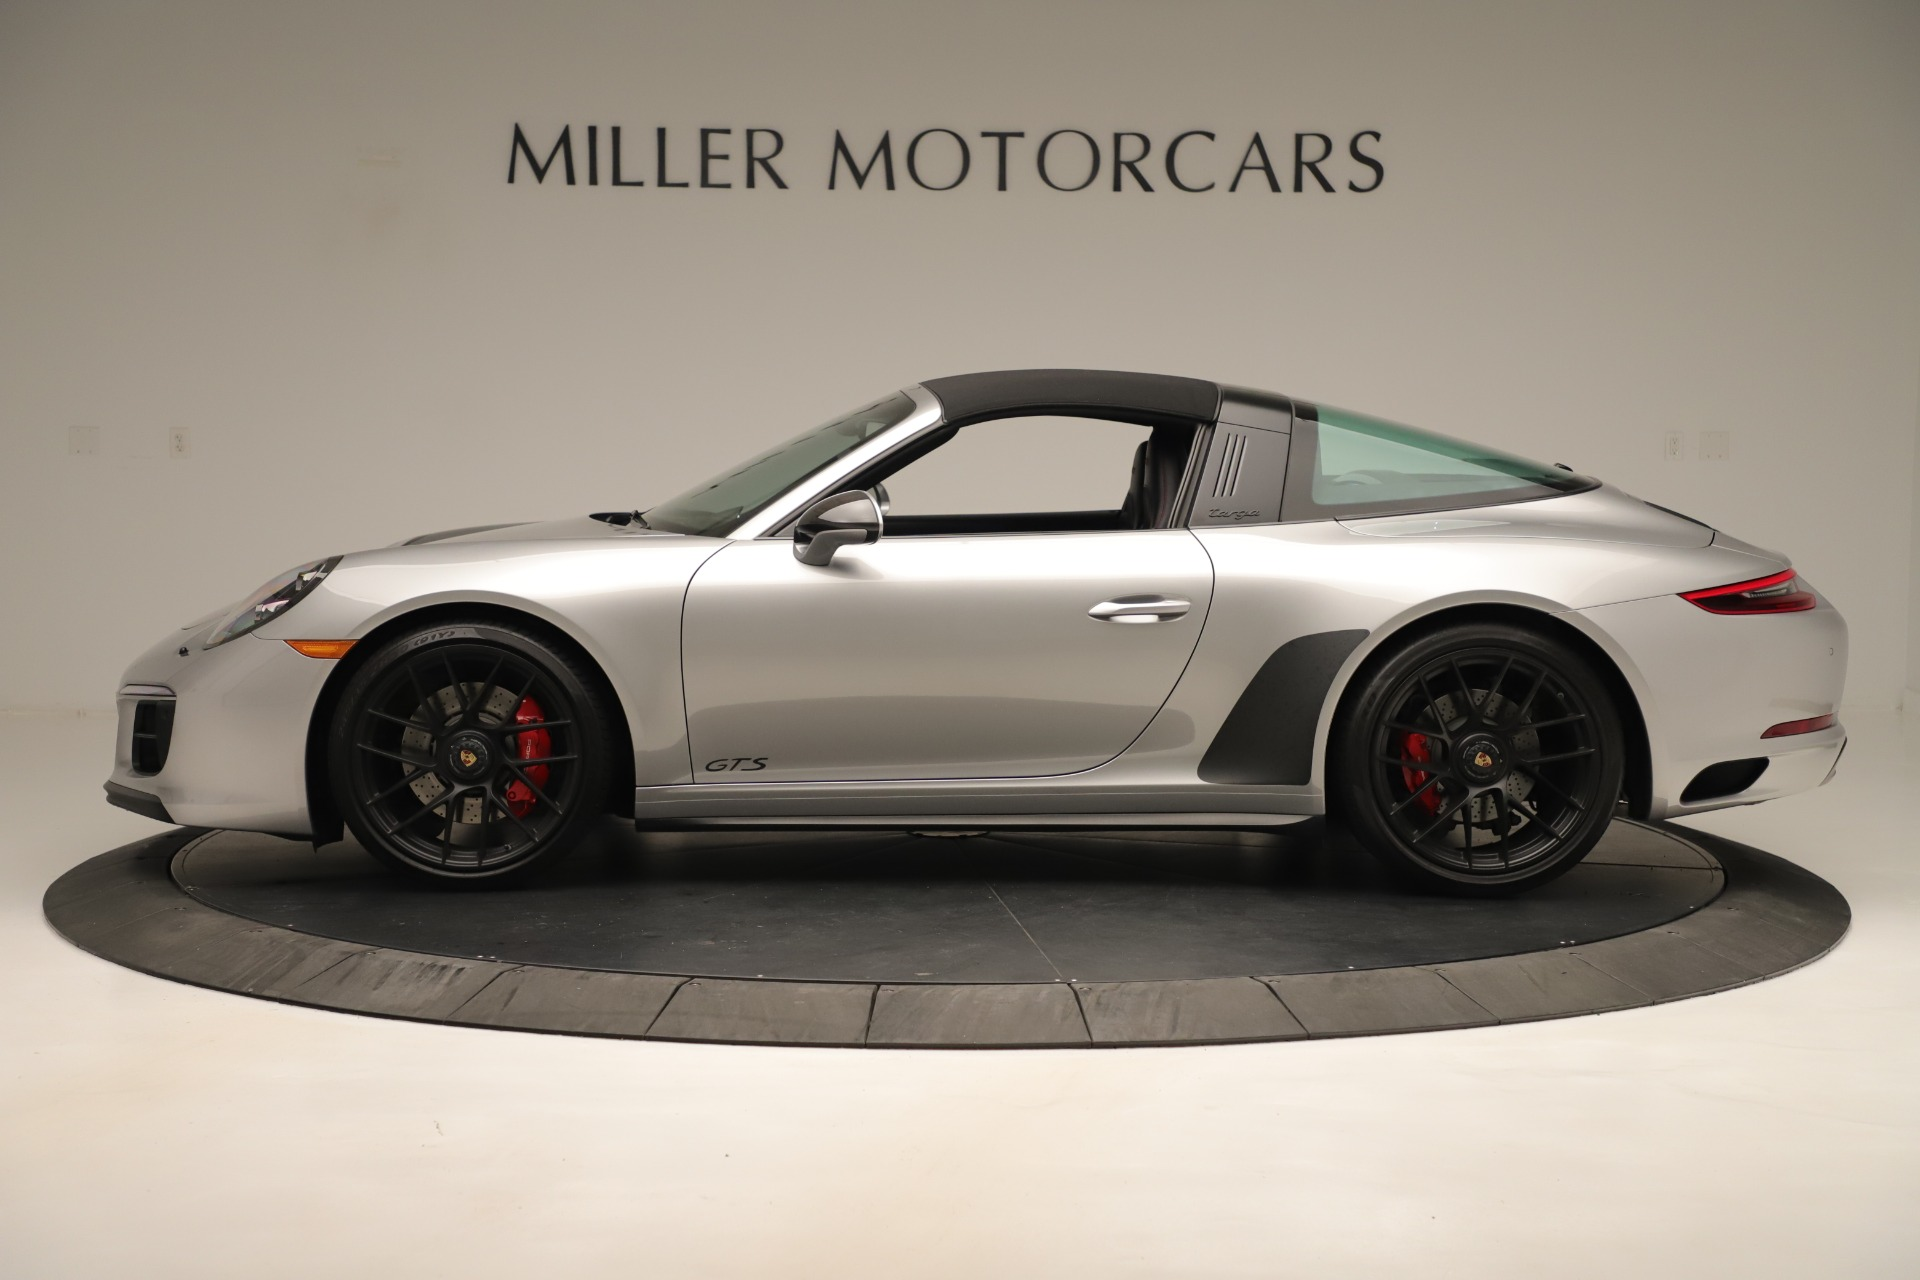 Used 2017 Porsche 911 Targa 4 GTS For Sale In Greenwich, CT 3374_p12